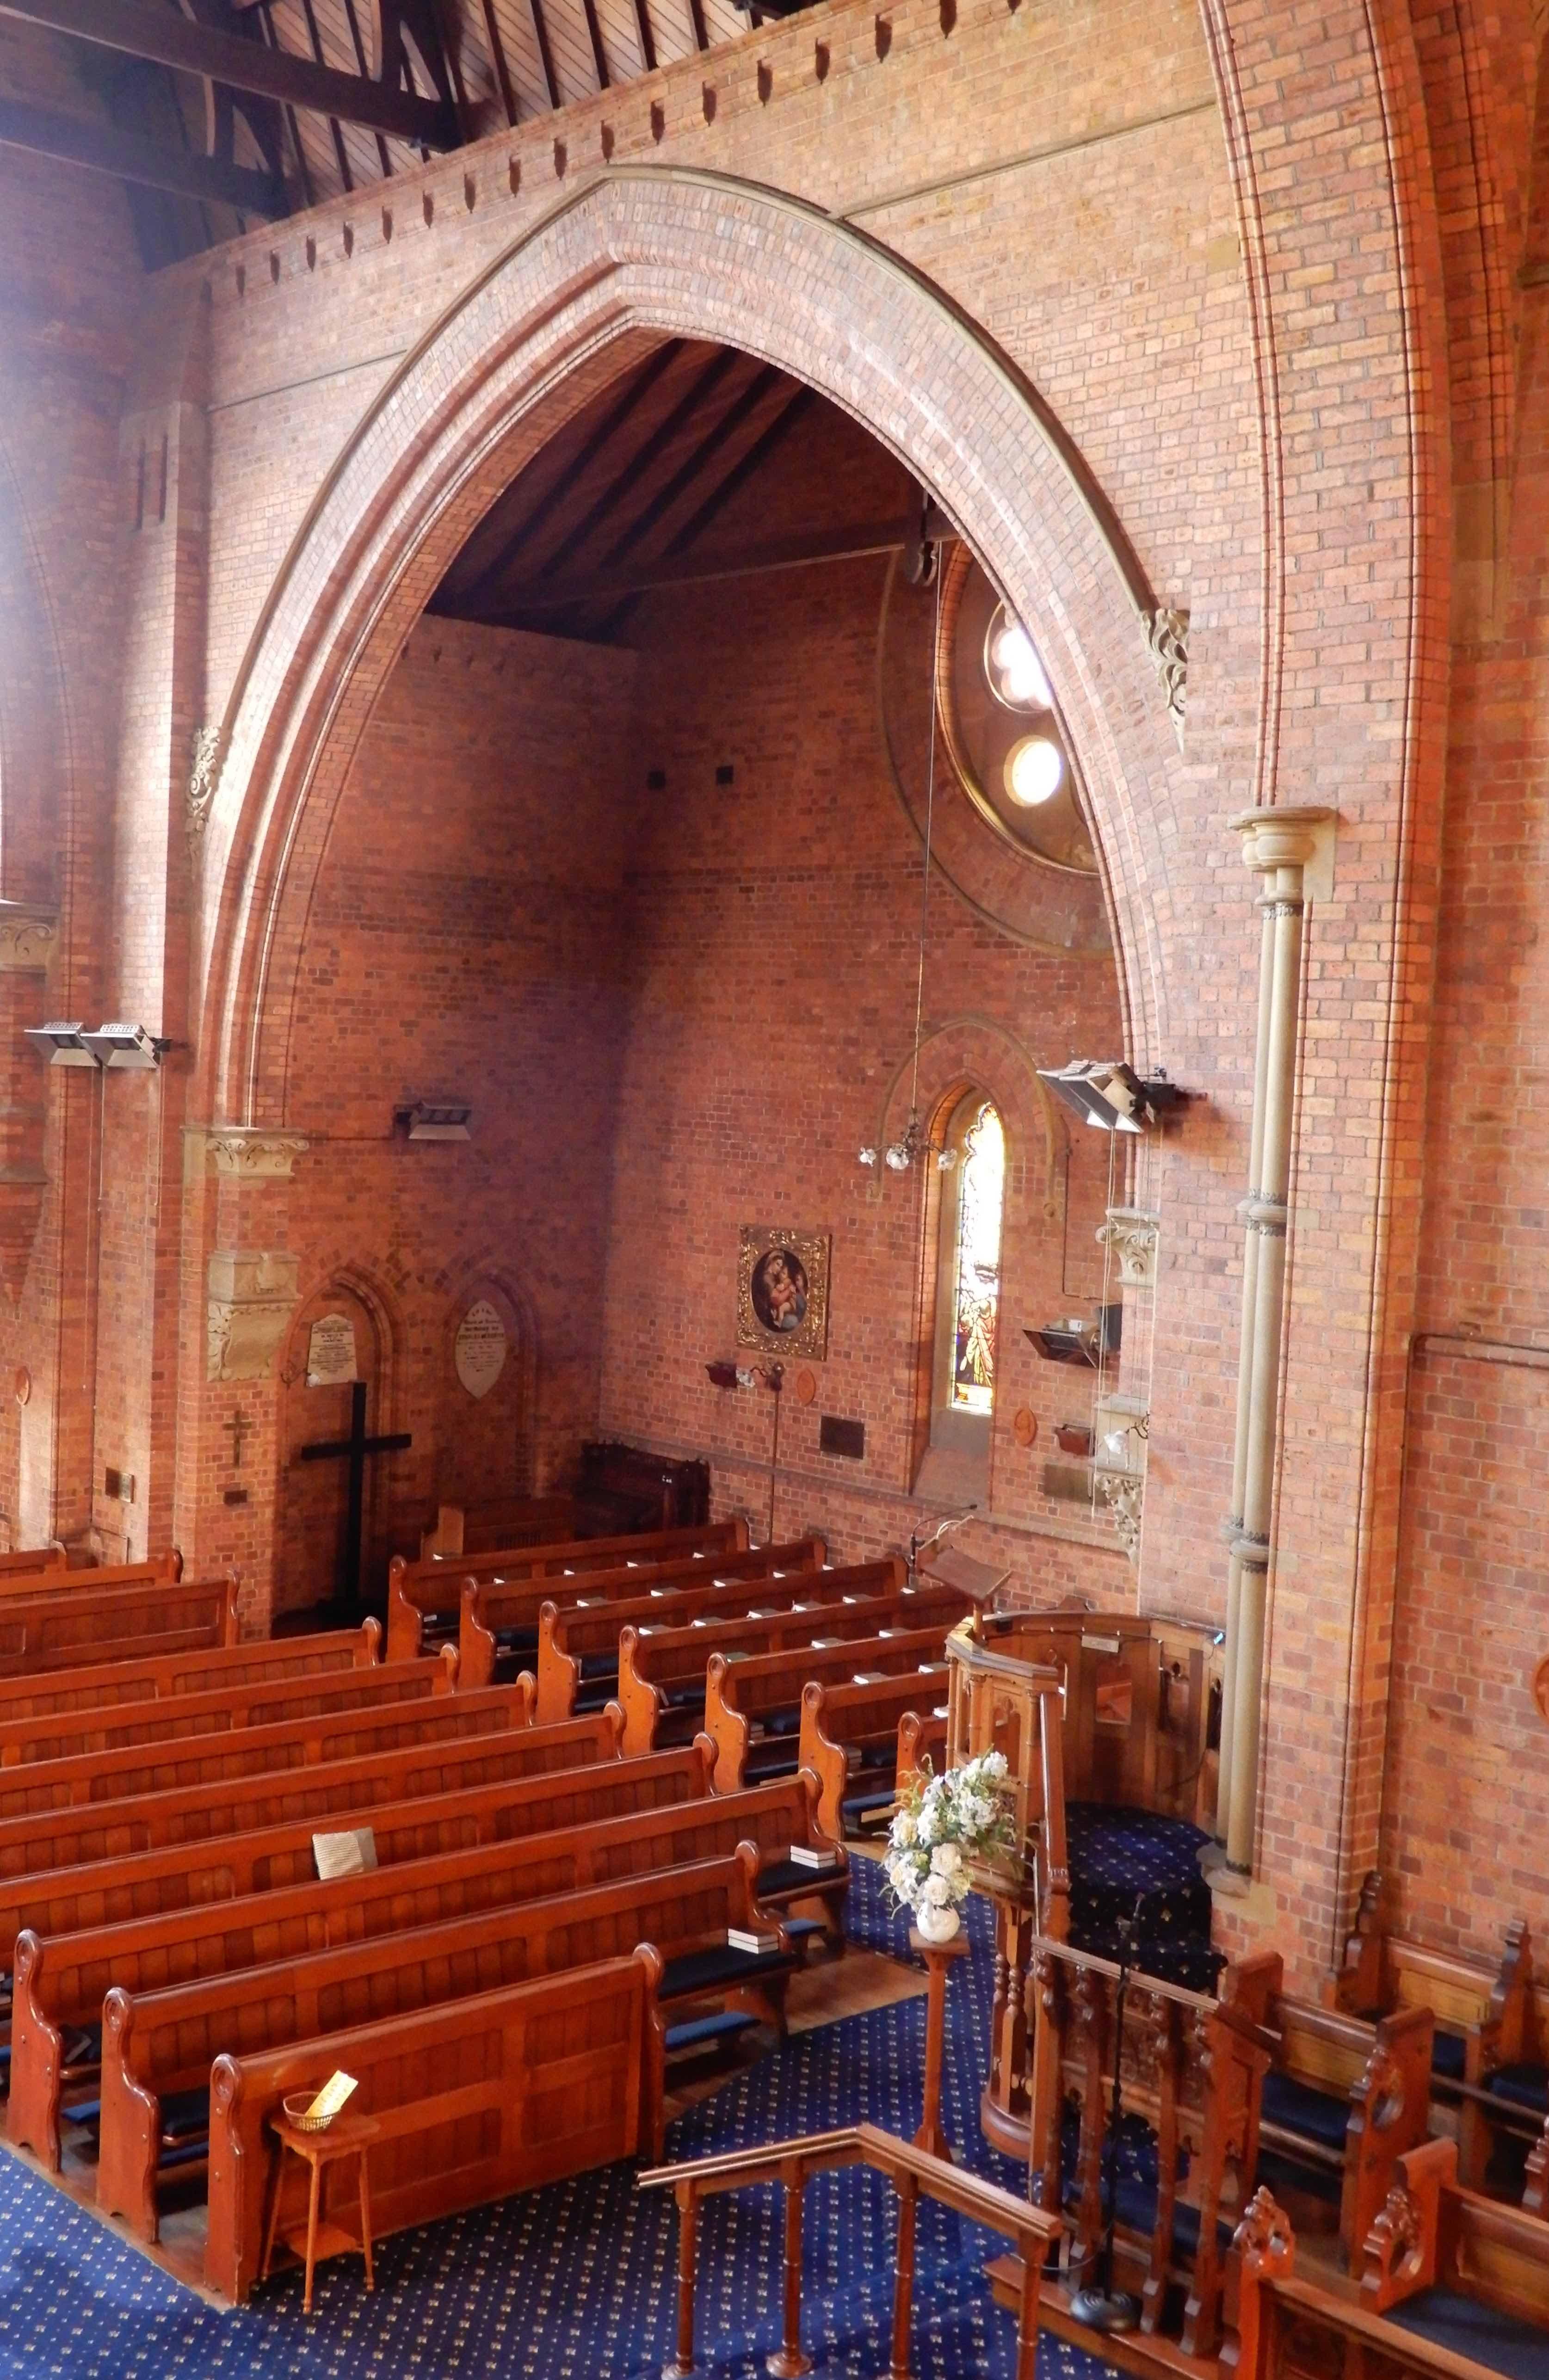 25.north wall from organ loft